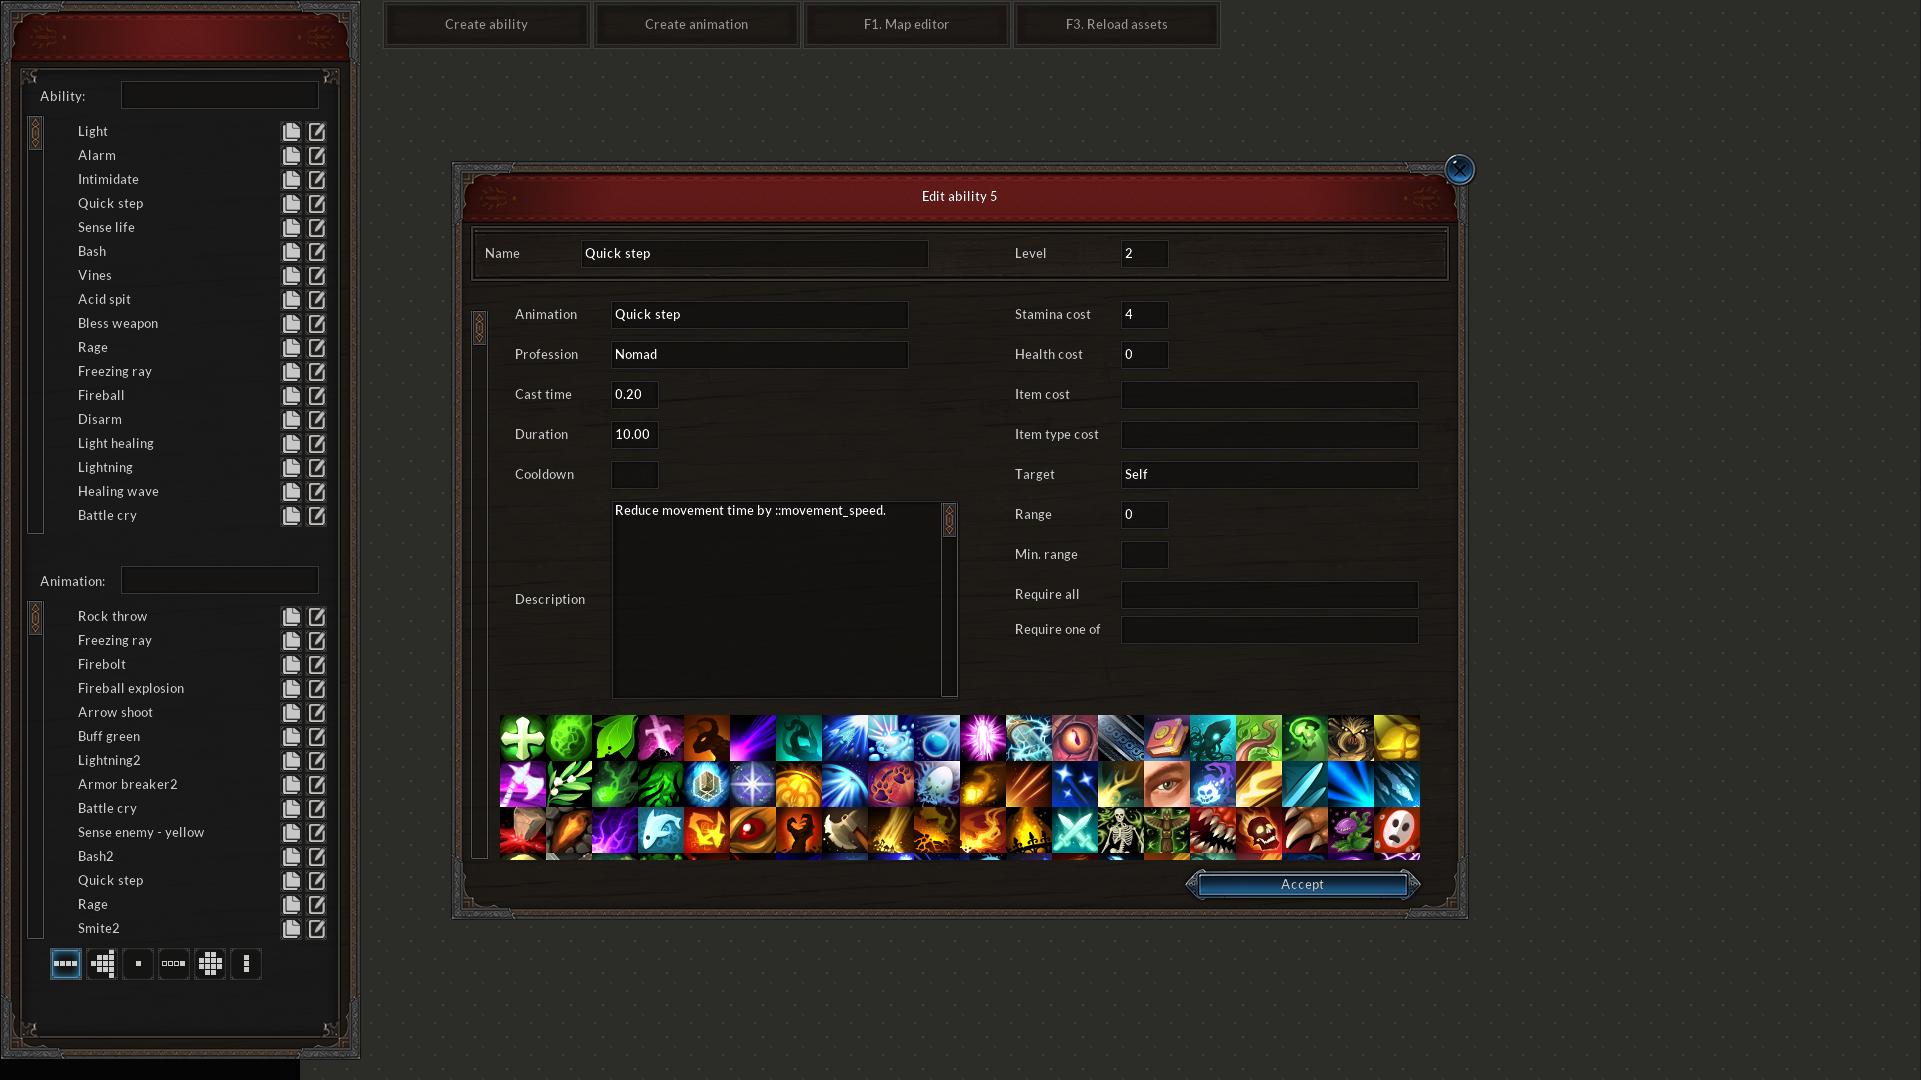 Ability Editor allows to create animated abilities